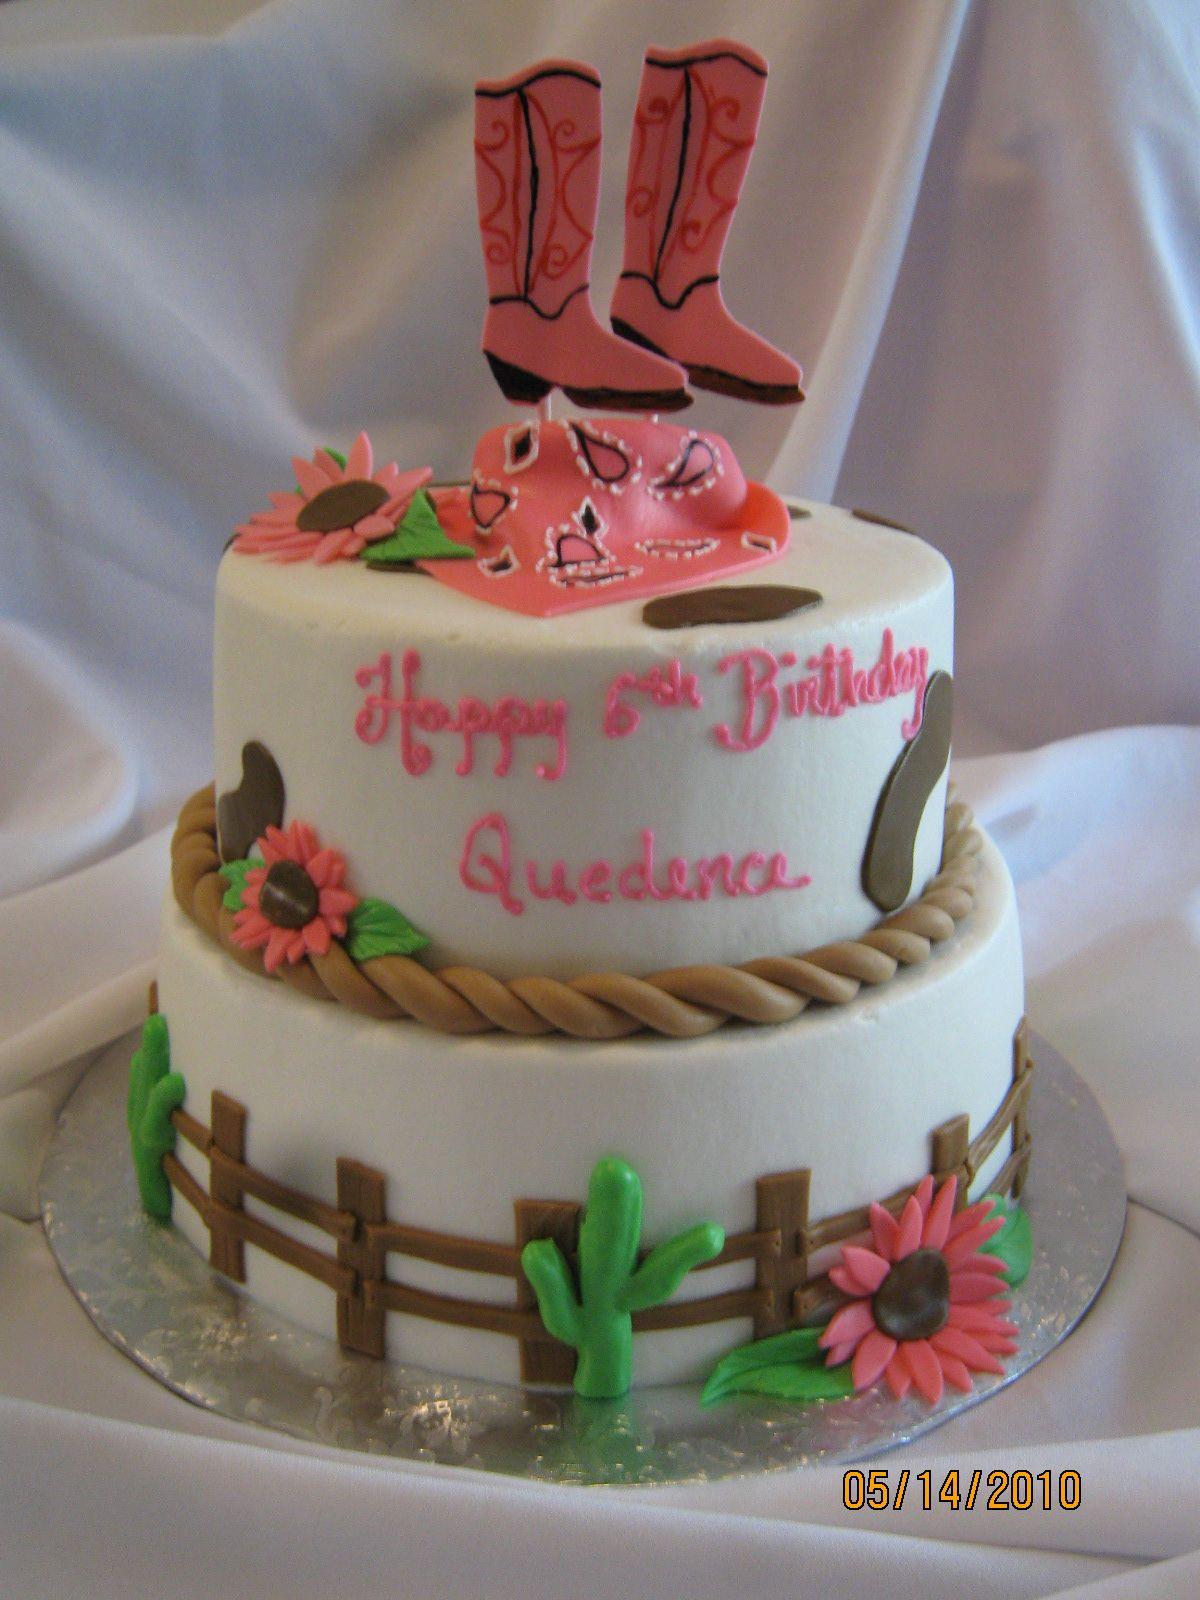 Wondrous Western Cake With Images Cowgirl Cakes Western Birthday Cakes Birthday Cards Printable Benkemecafe Filternl